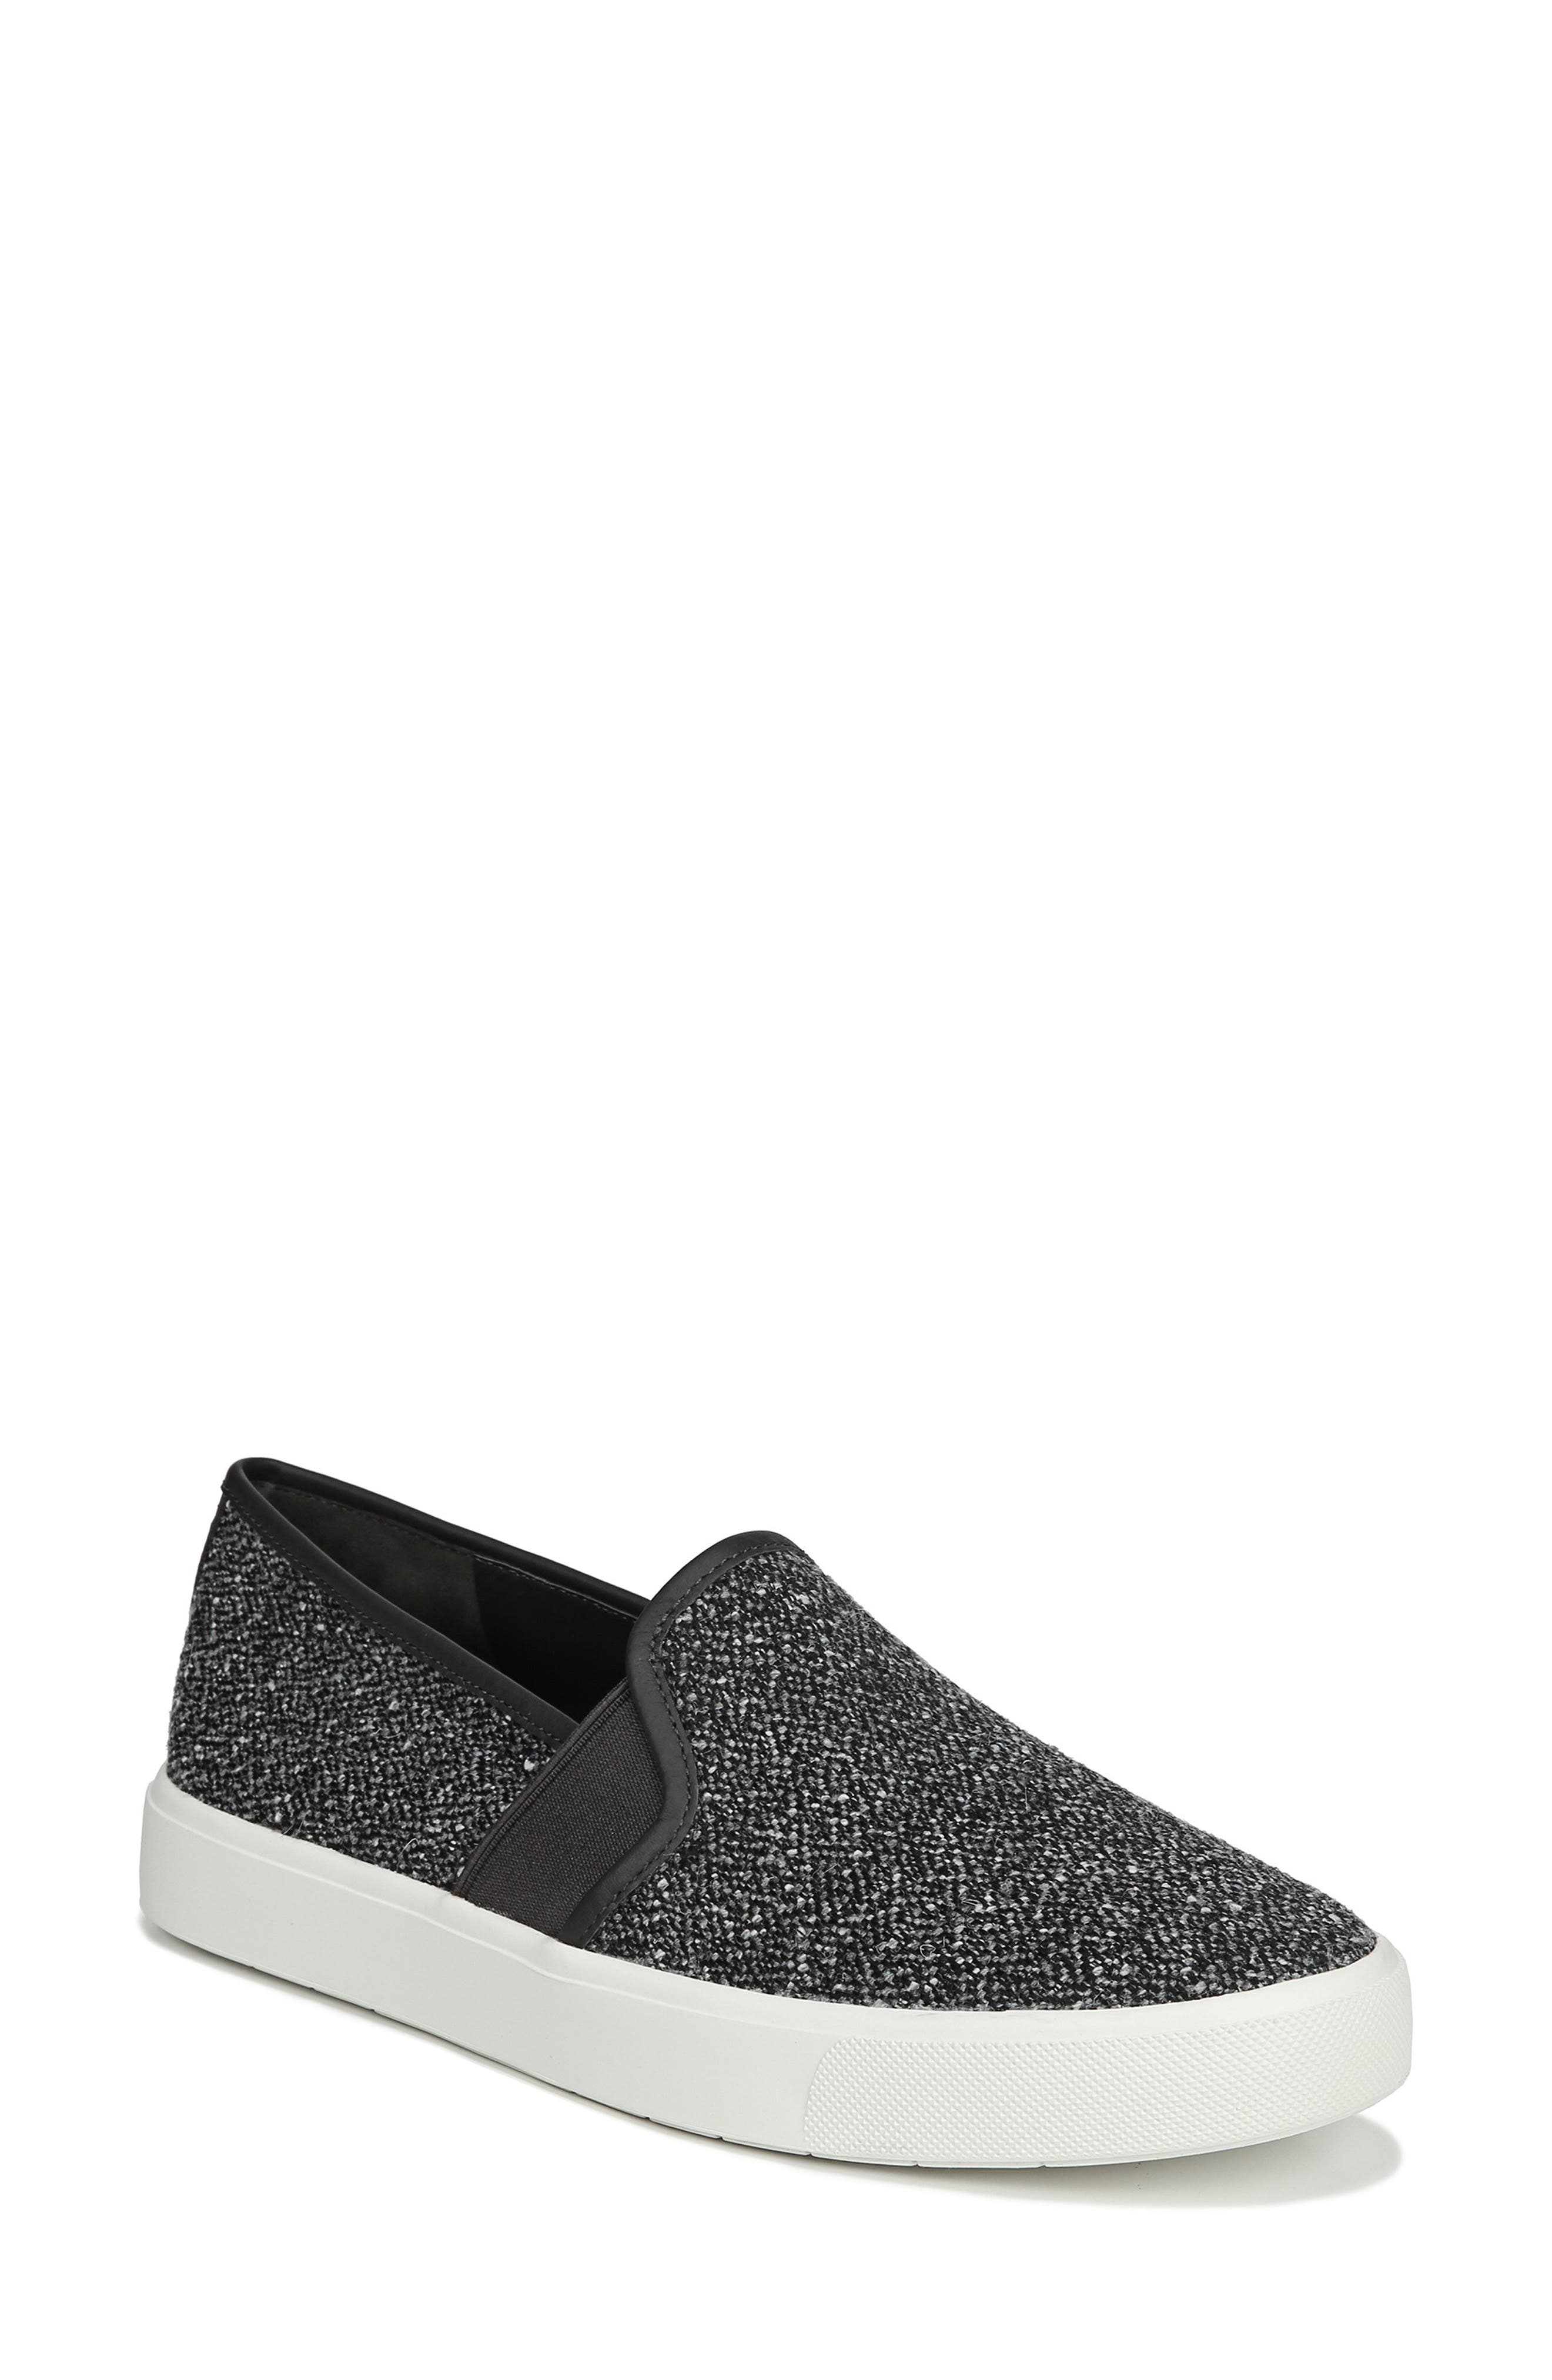 Blair 5 Slip-On Sneaker,                             Main thumbnail 1, color,                             GREY